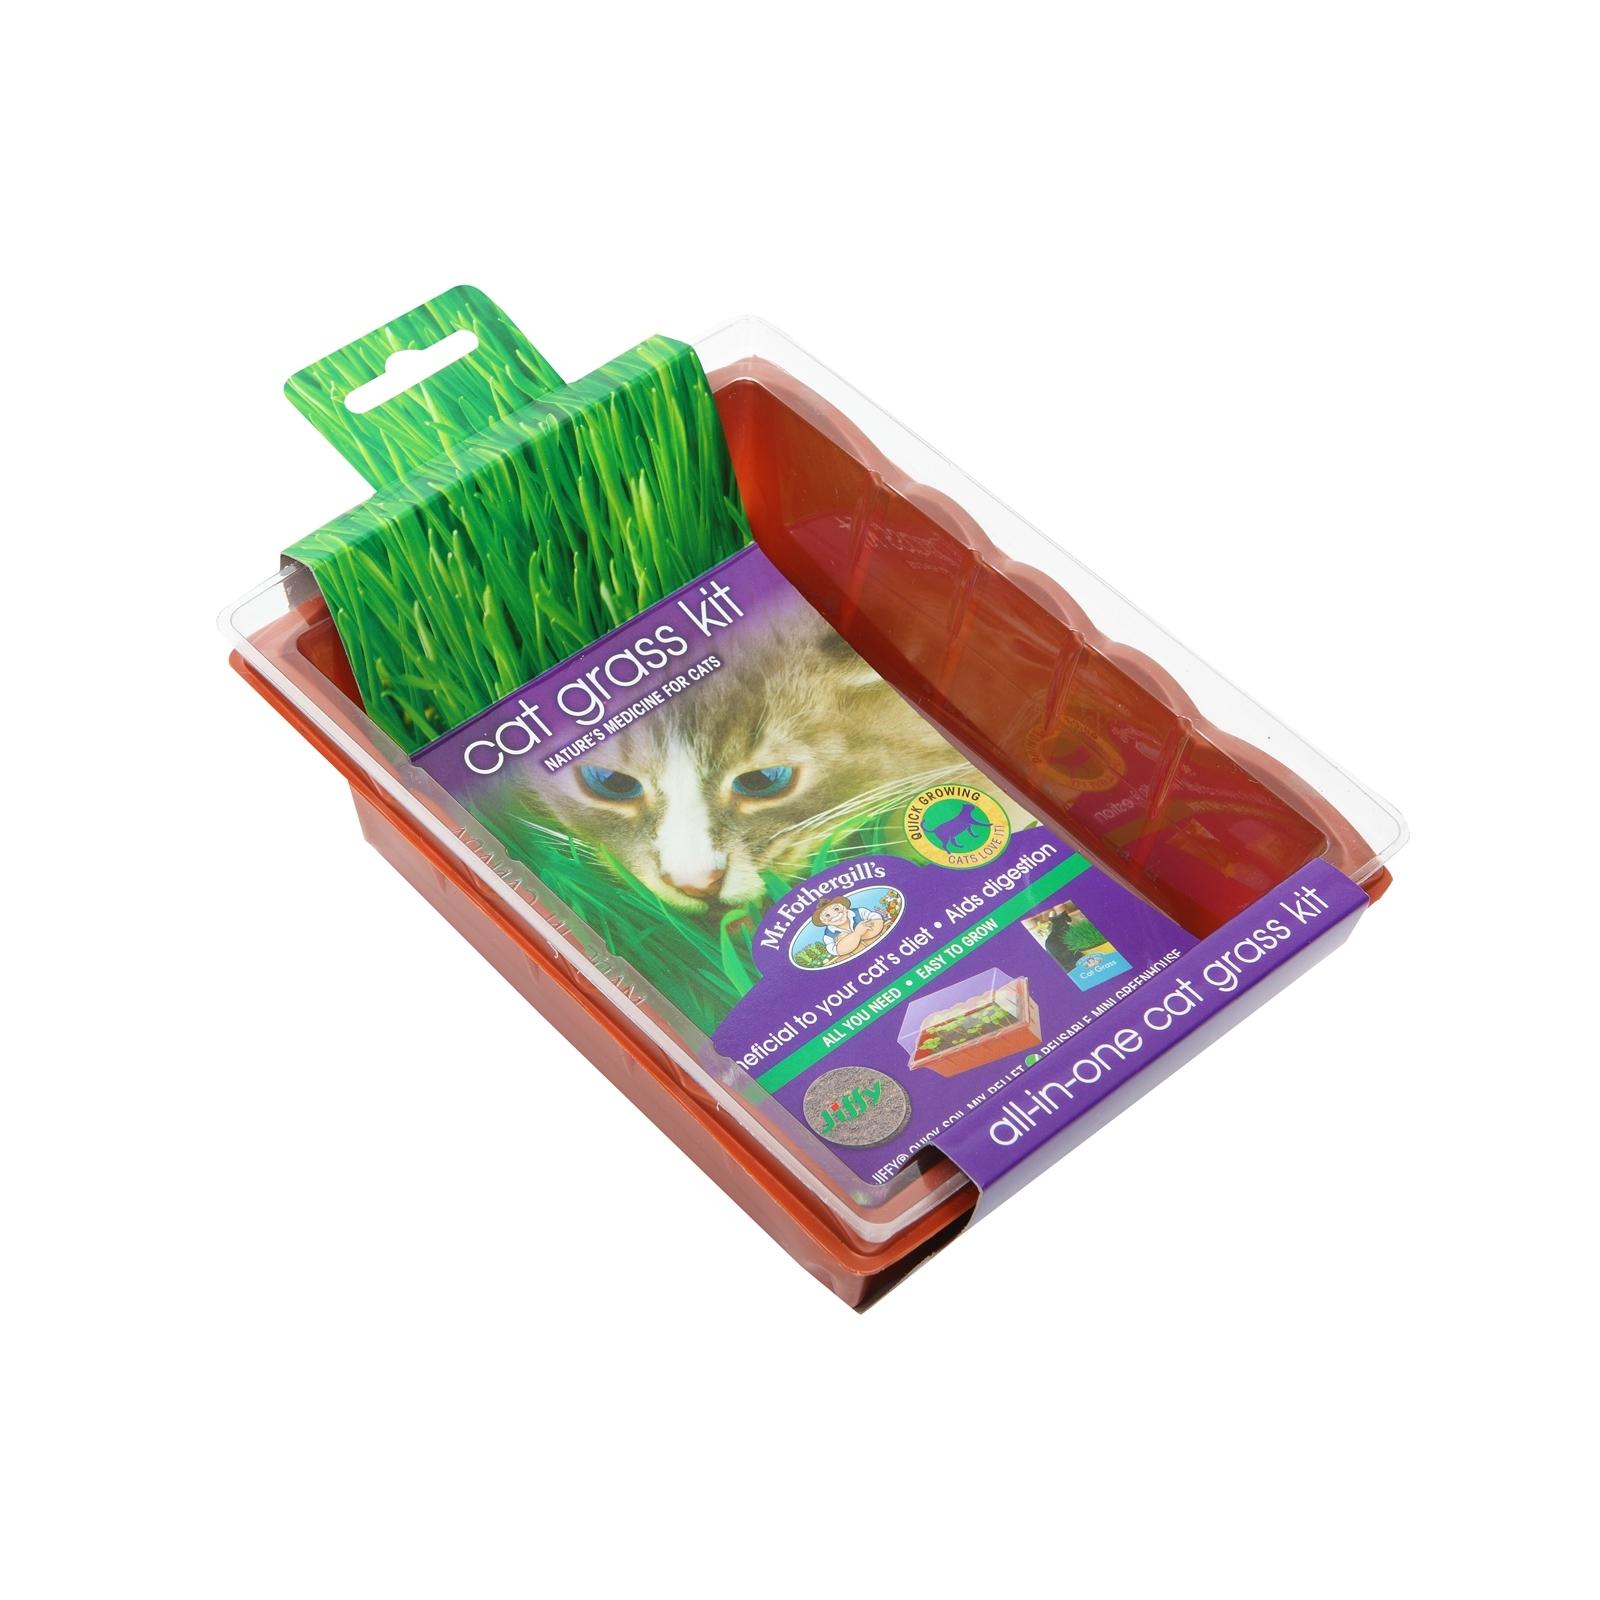 Mr Fothergills Cat Grass Seed Raiser Kit